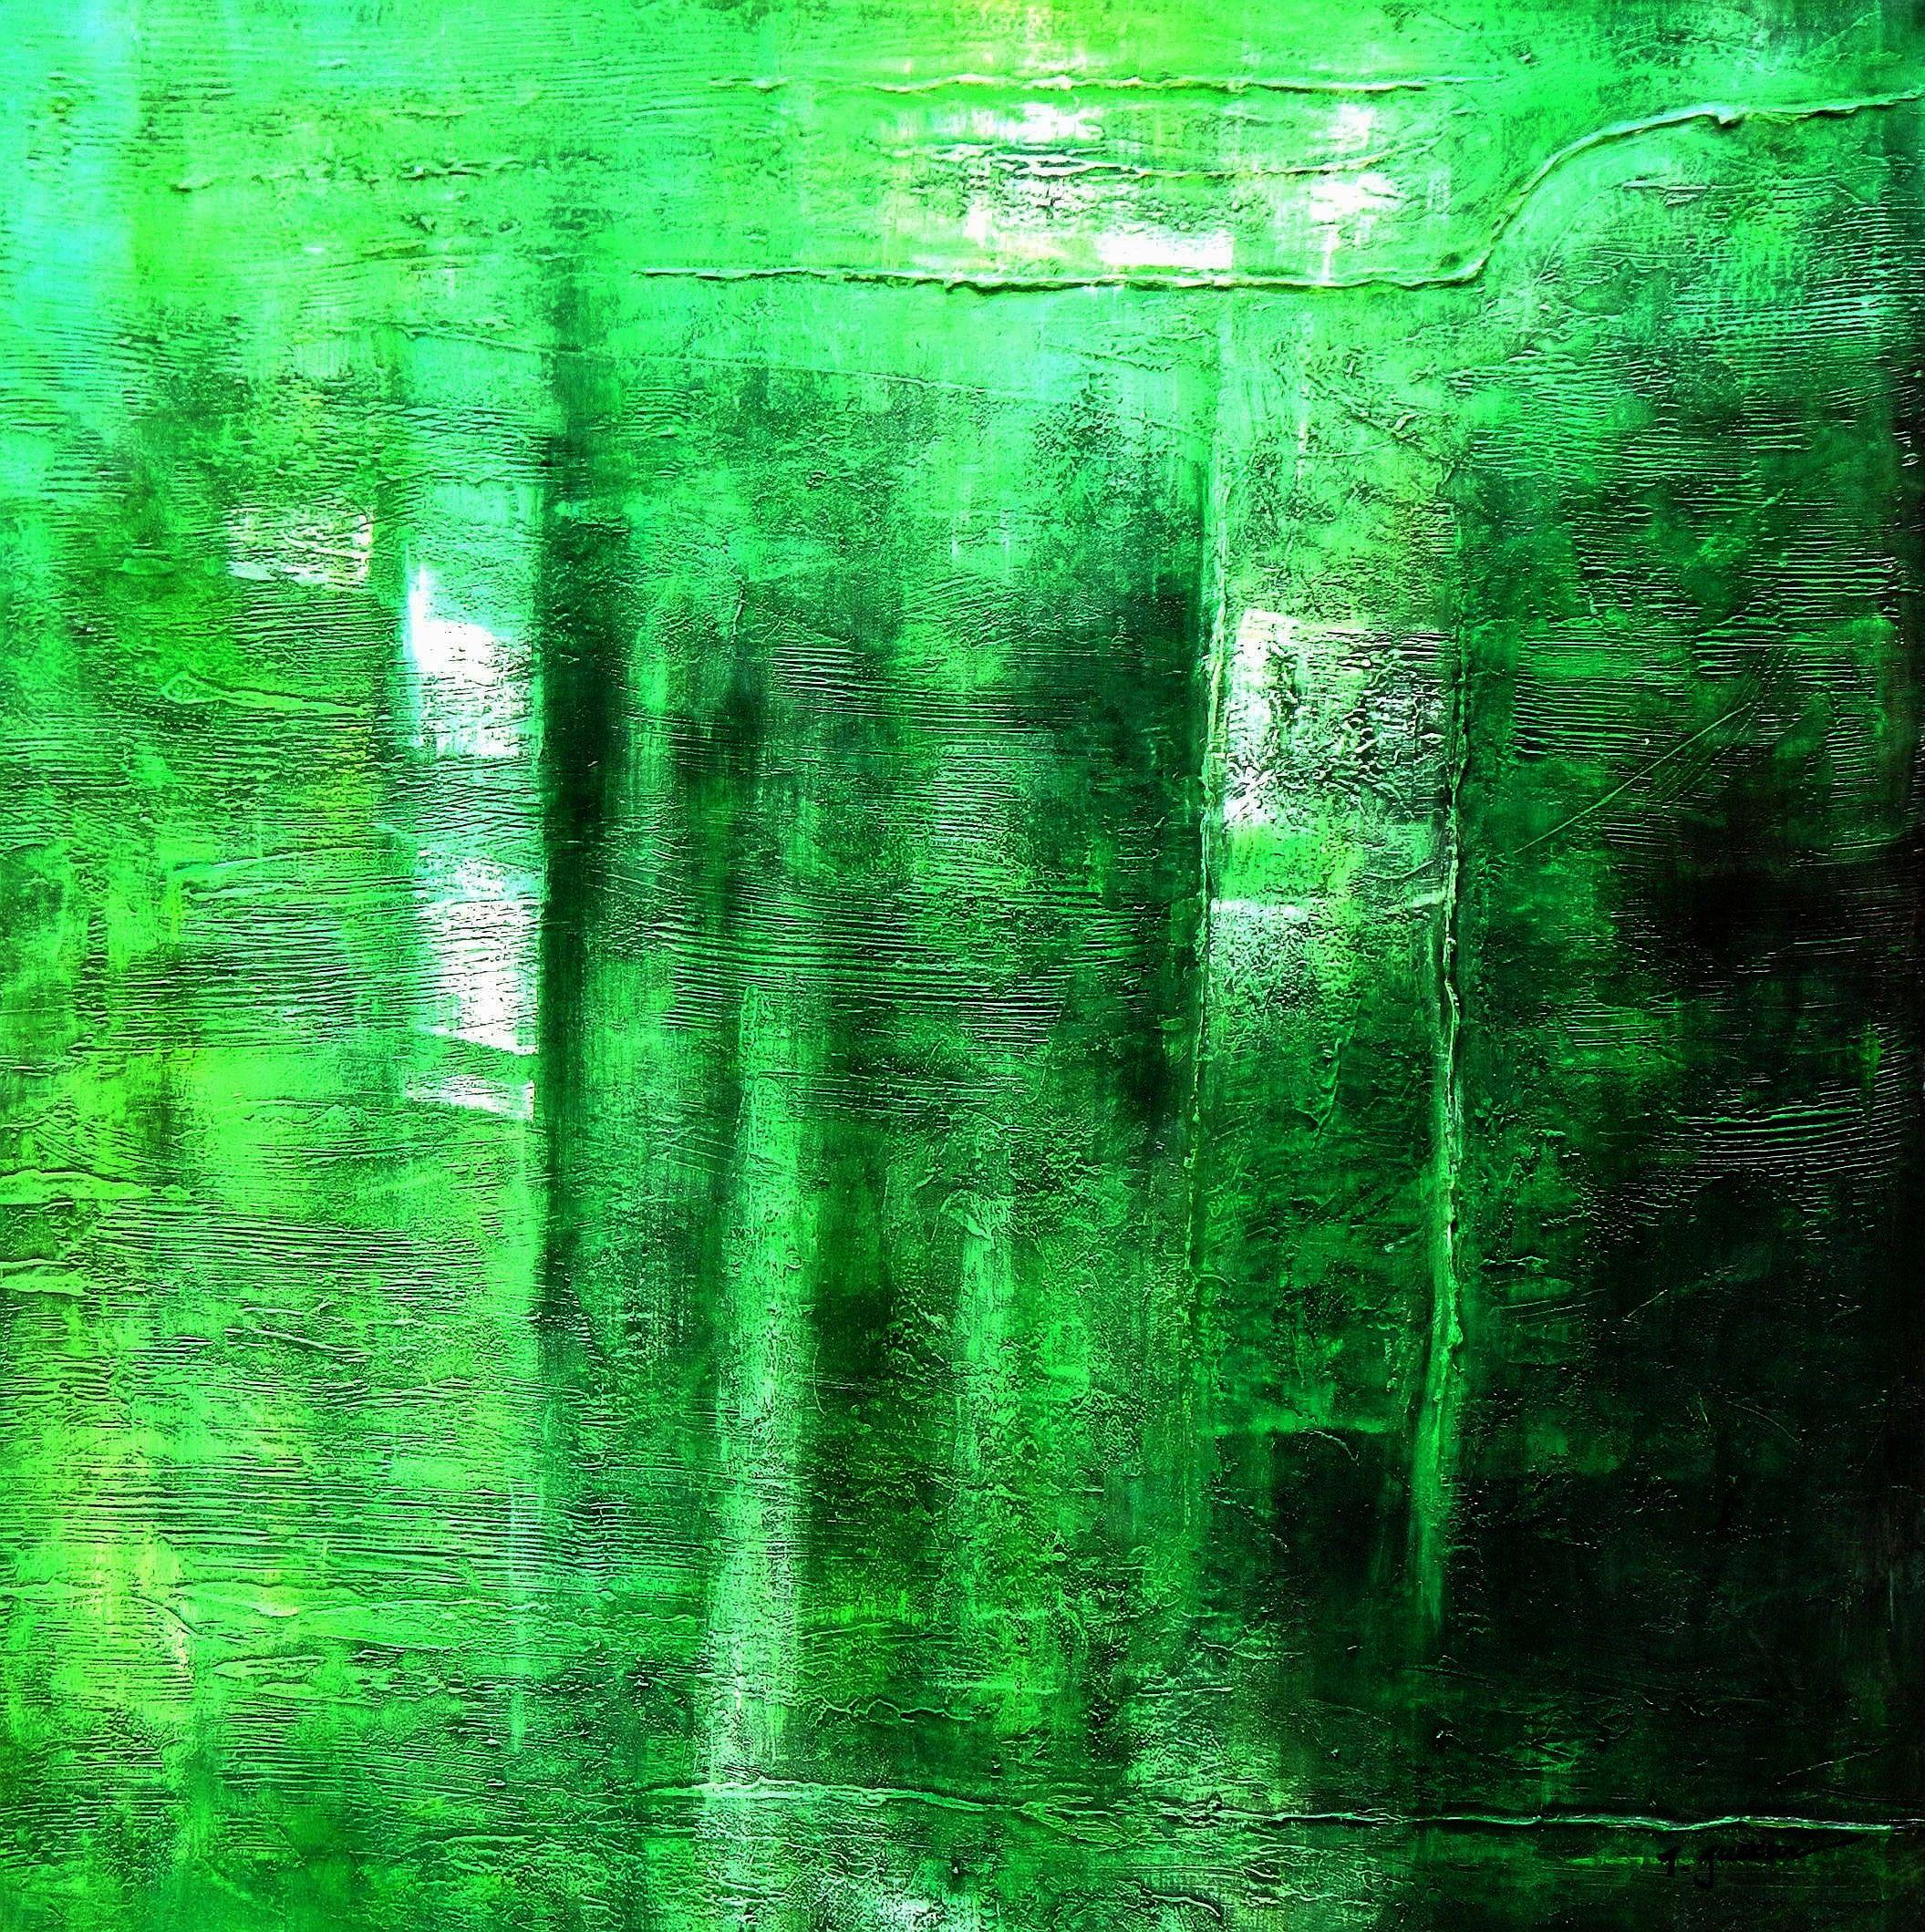 Abstrakt - Berlin an der Siegessäule m96928 120x120cm abstraktes Ölgemälde